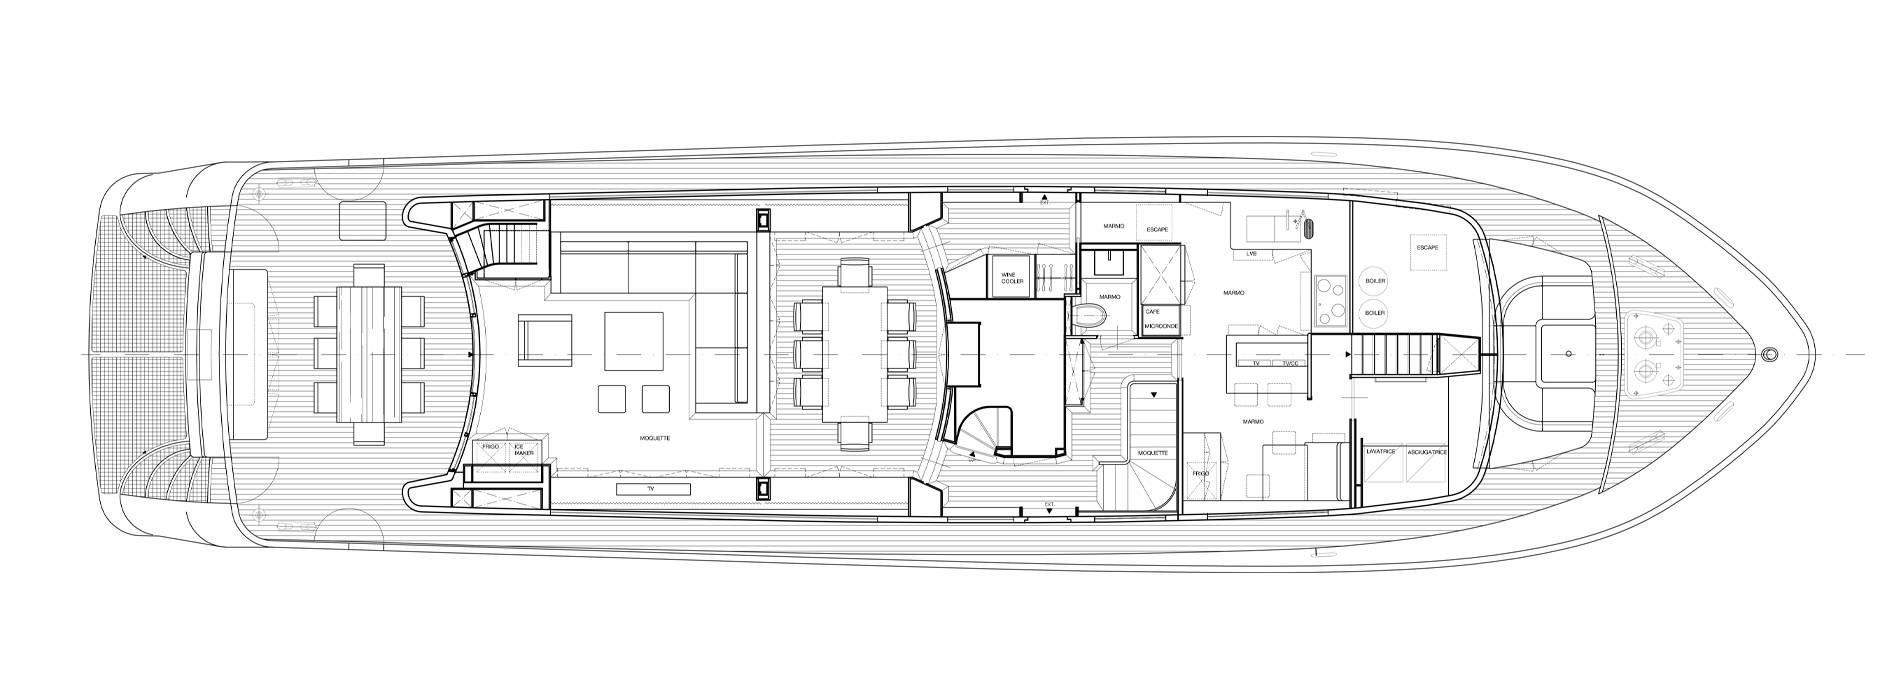 Sanlorenzo Yachts SL88-541 主甲板